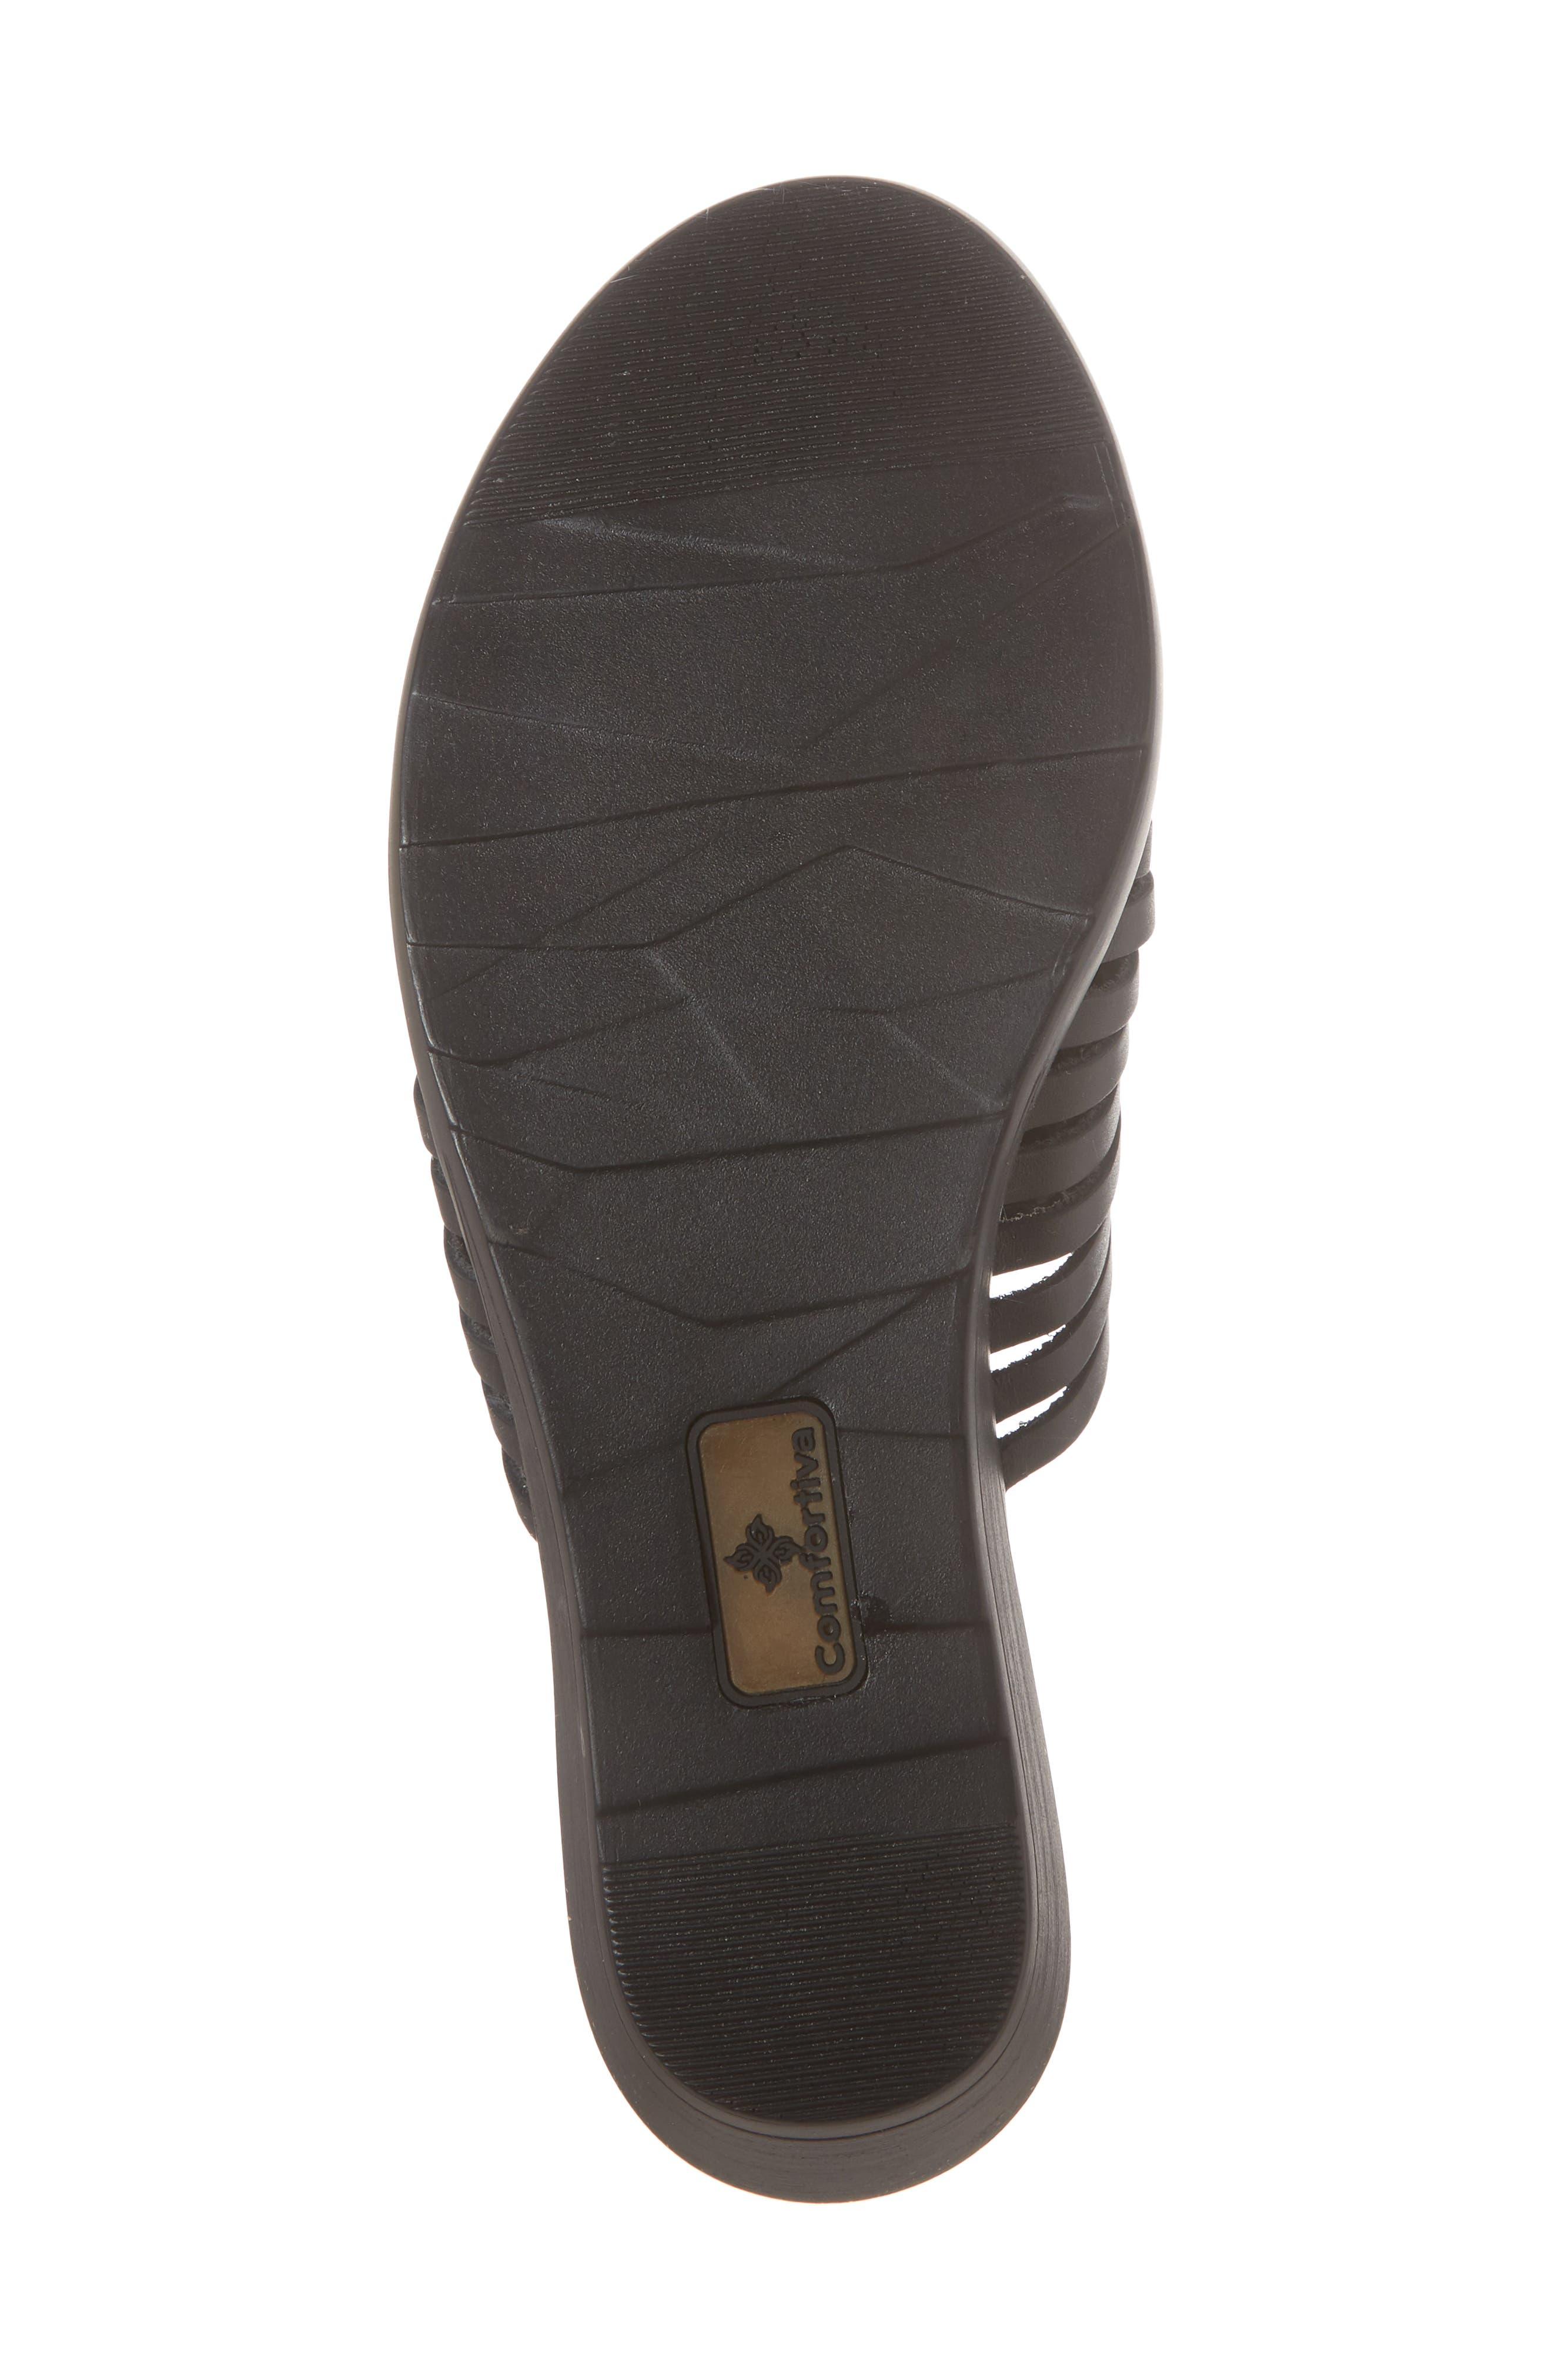 Felida Huarache Slide Sandal,                             Alternate thumbnail 6, color,                             Black Leather